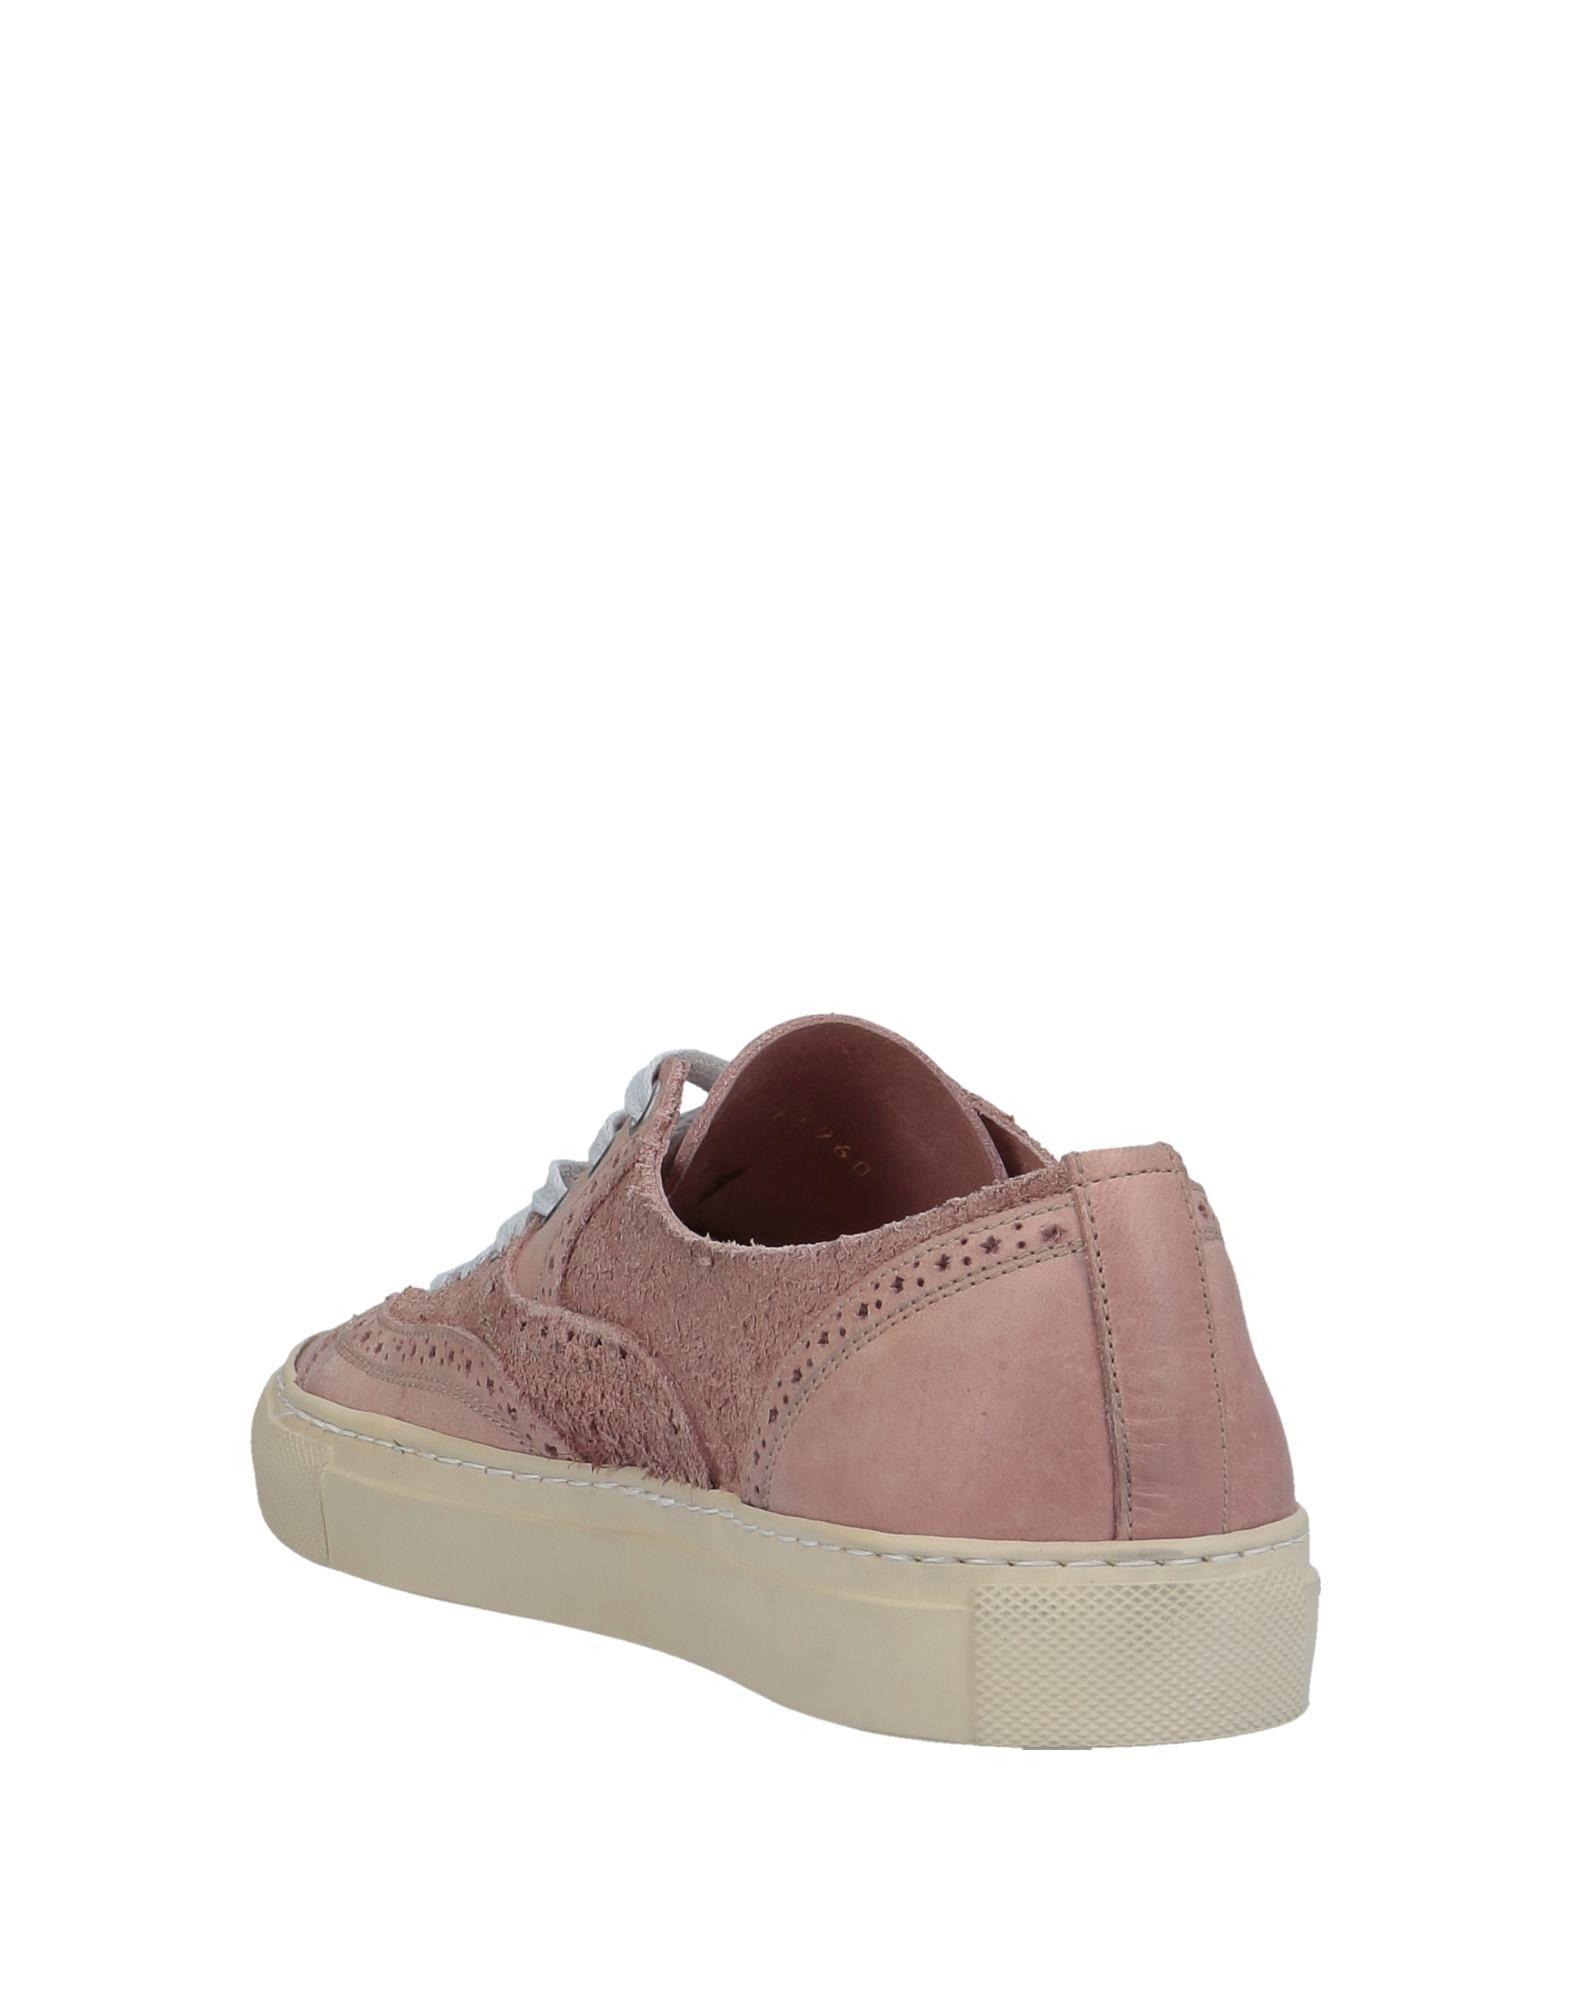 Stilvolle billige Schuhe Buttero® Sneakers Damen    11460213QL c53d3a